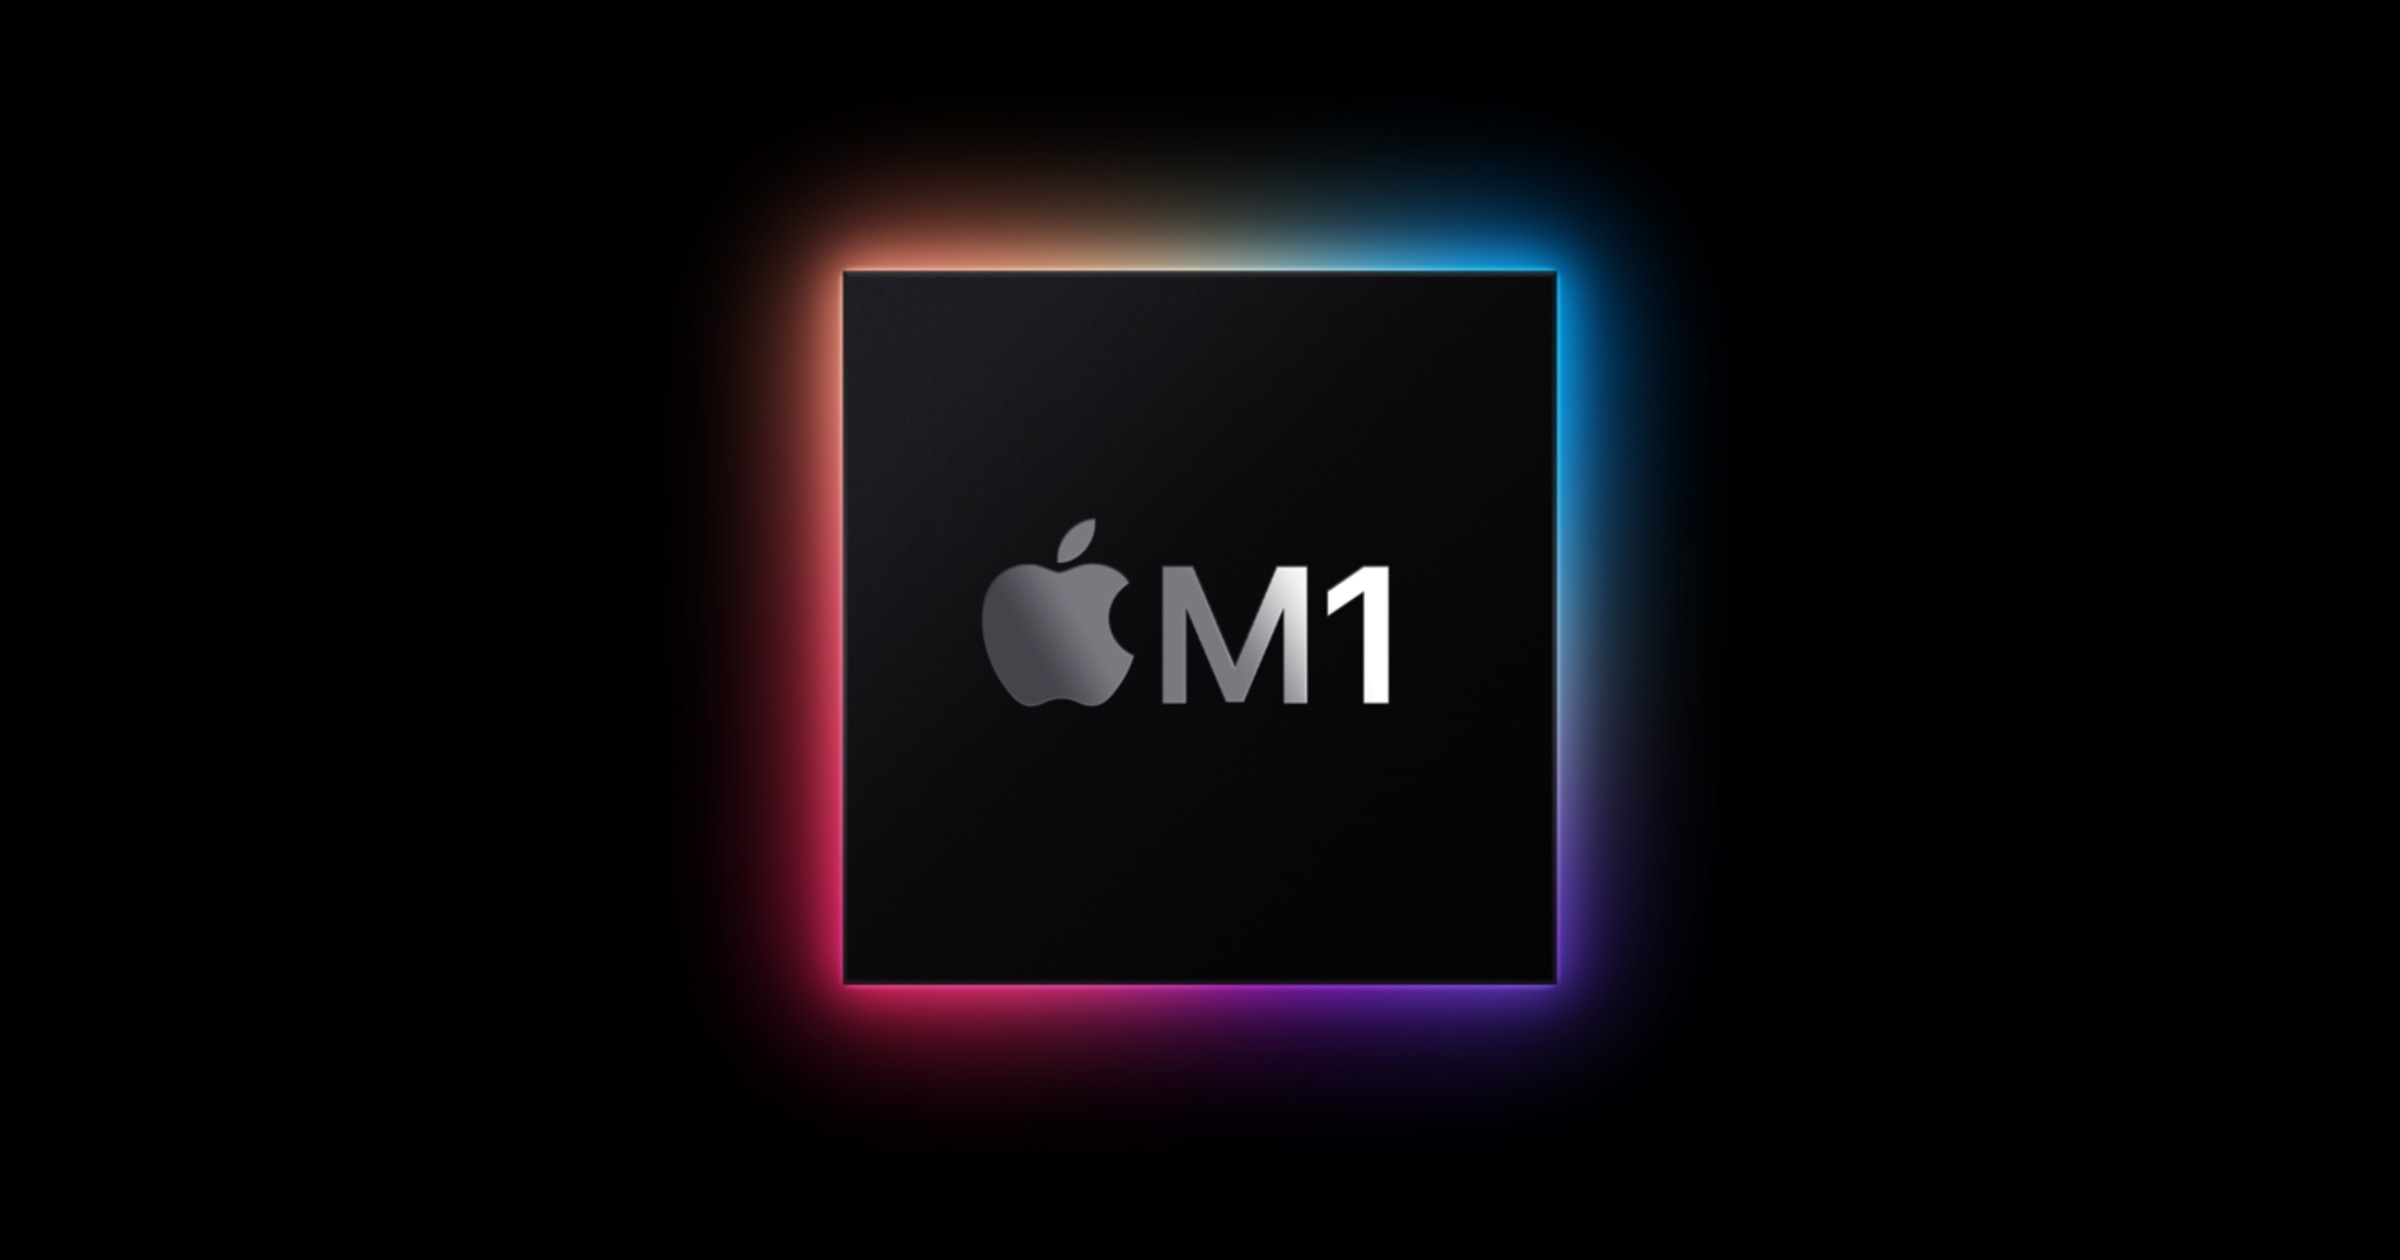 M1 chip graphic